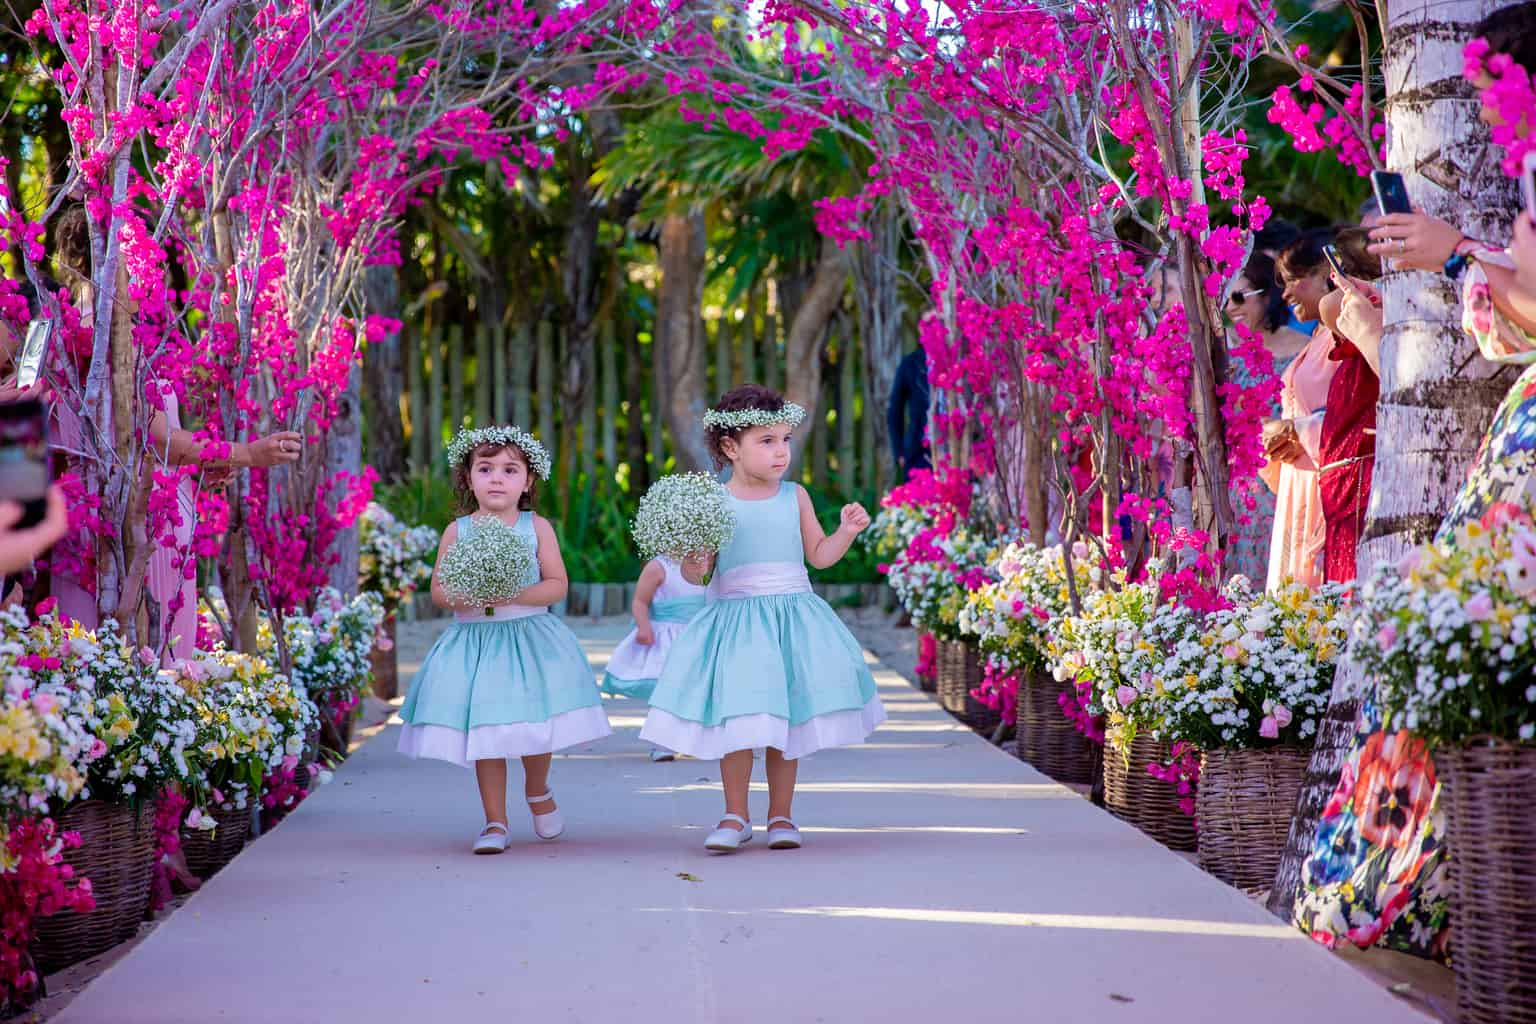 casamento-Taina-e-Hugo-Itapororoca-Villa-Trancoso-Patricia-Galvao-Sotter-Fotografia-Cerimonia-na-praia482daminhas